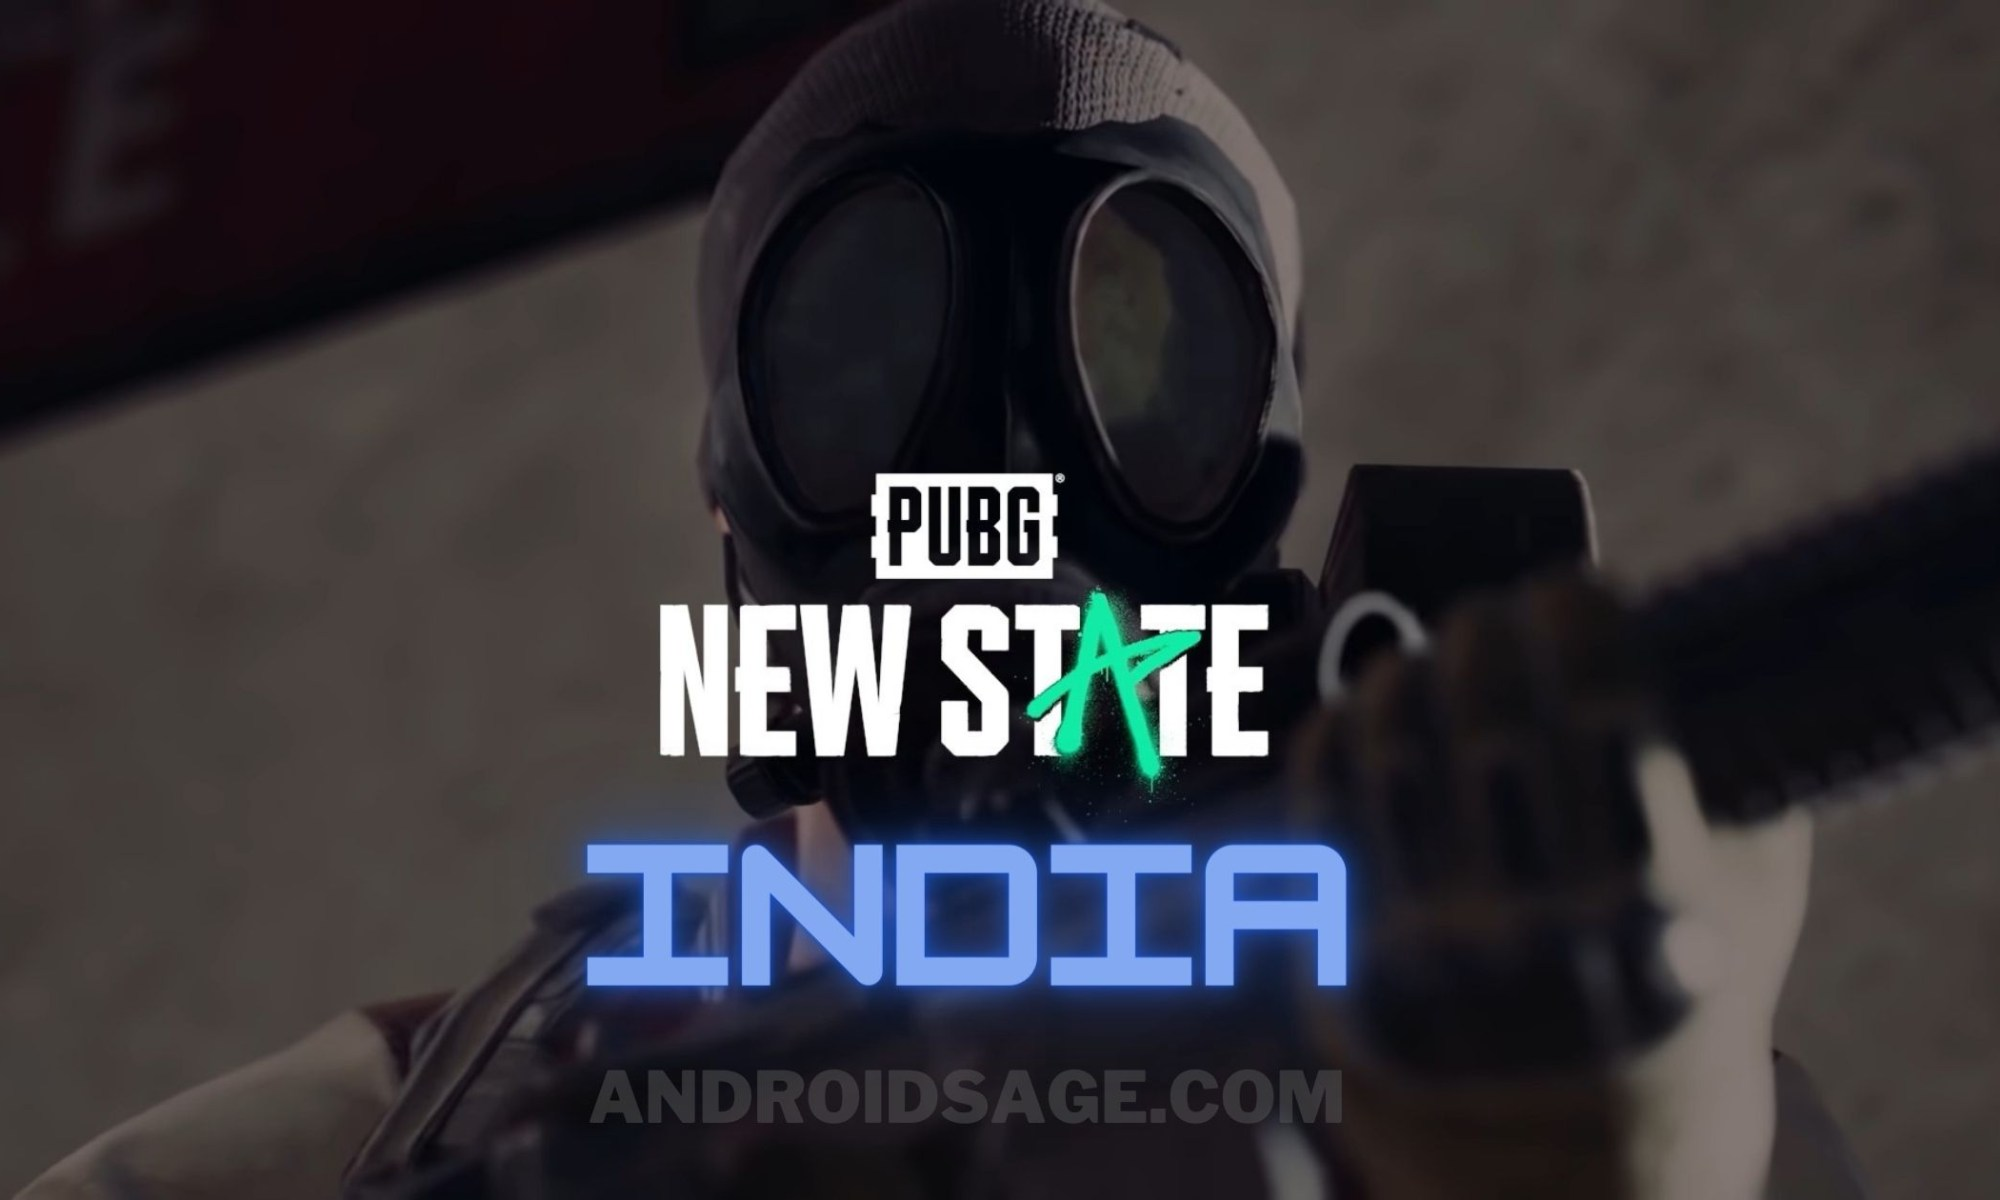 PUBG NEW STATE India APK Download